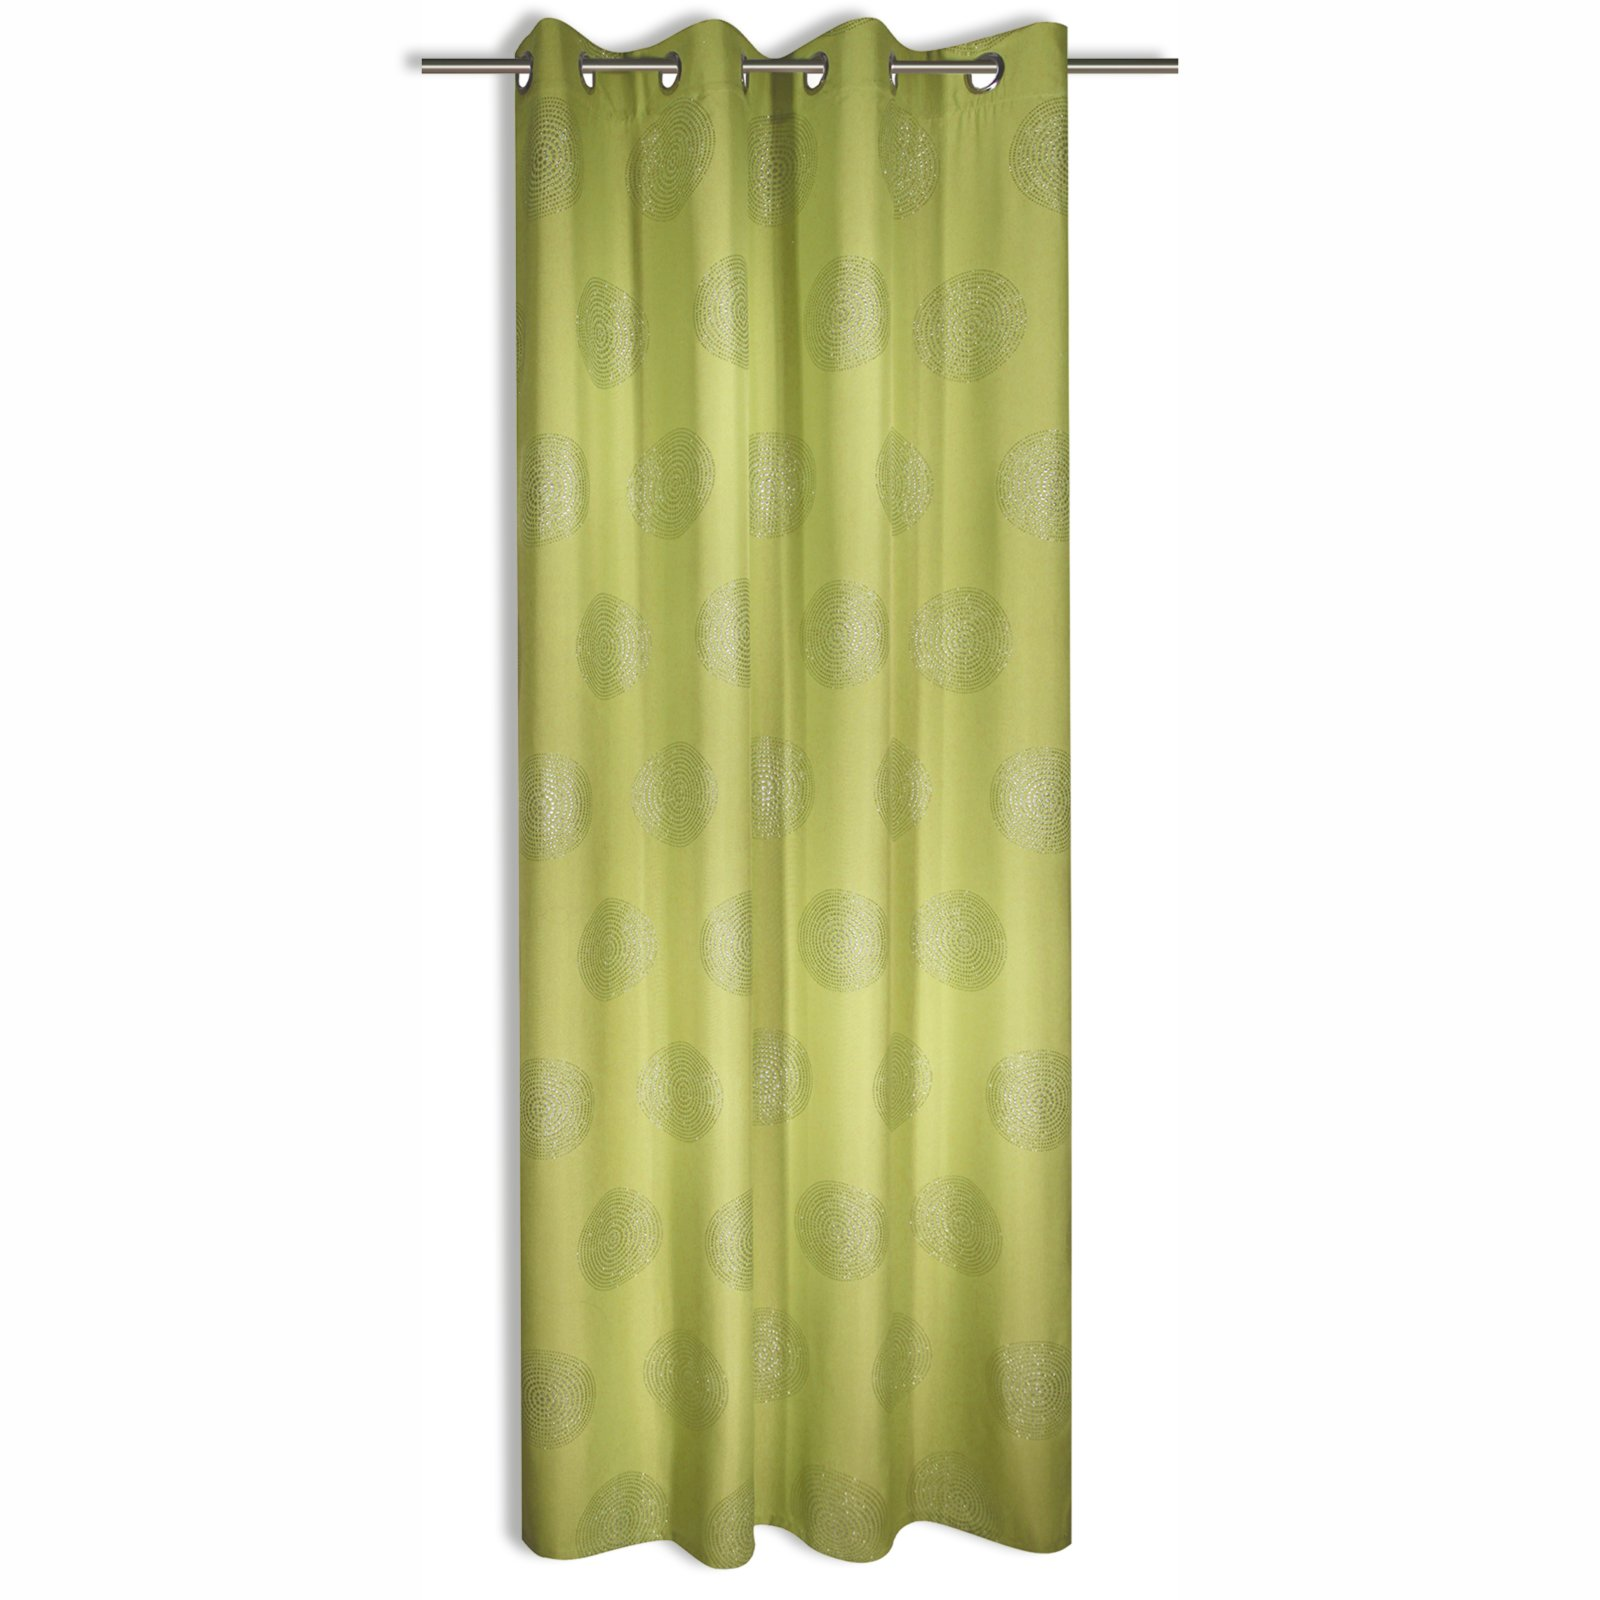 gardinen deko gardinen gr n blickdicht gardinen. Black Bedroom Furniture Sets. Home Design Ideas